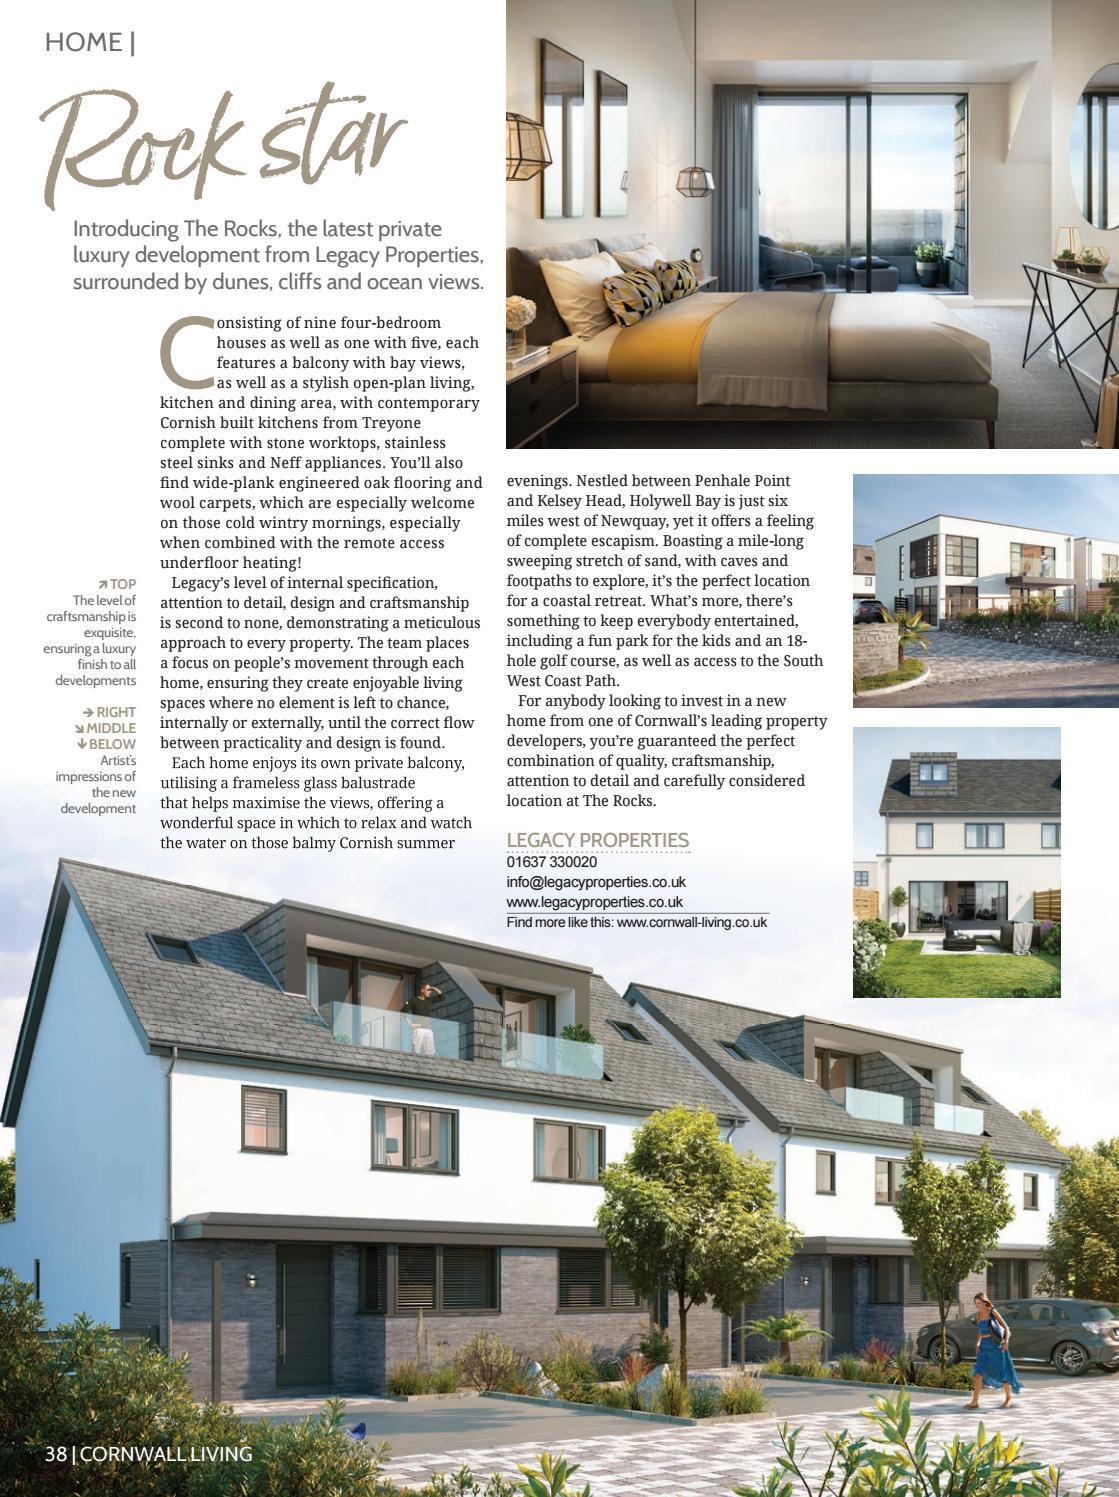 Cornwall living 70 engine house media